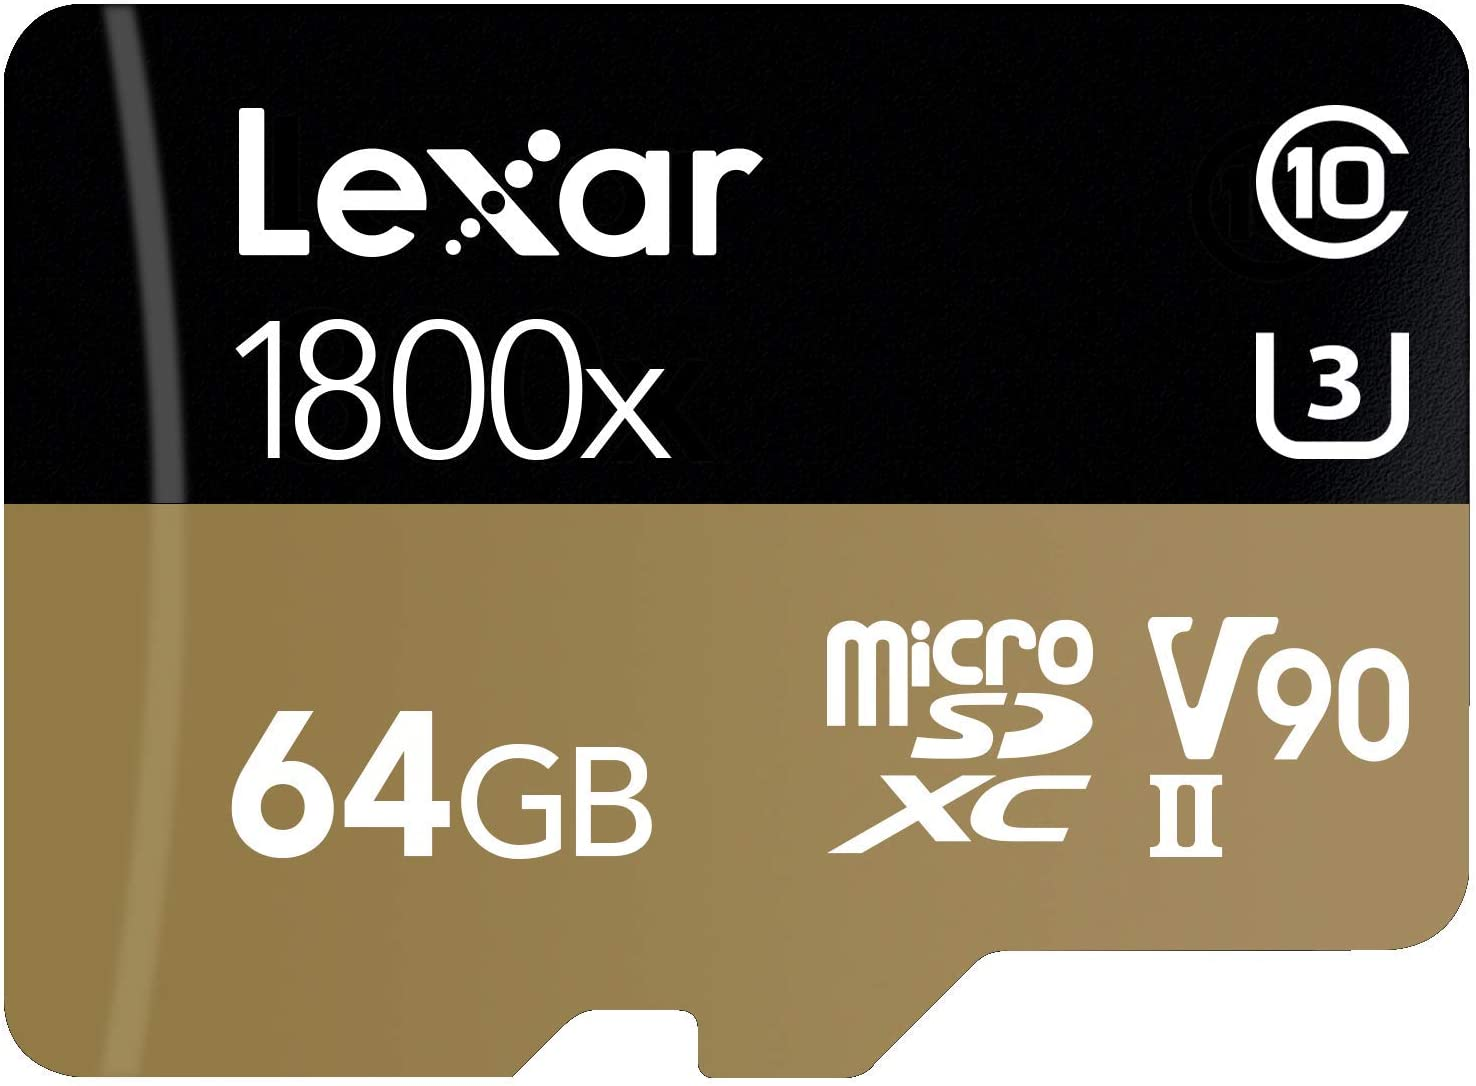 Lexar Professional 1800x 64GB microSDXC UHS-II Card (LSDMI64GCBNA1800A)